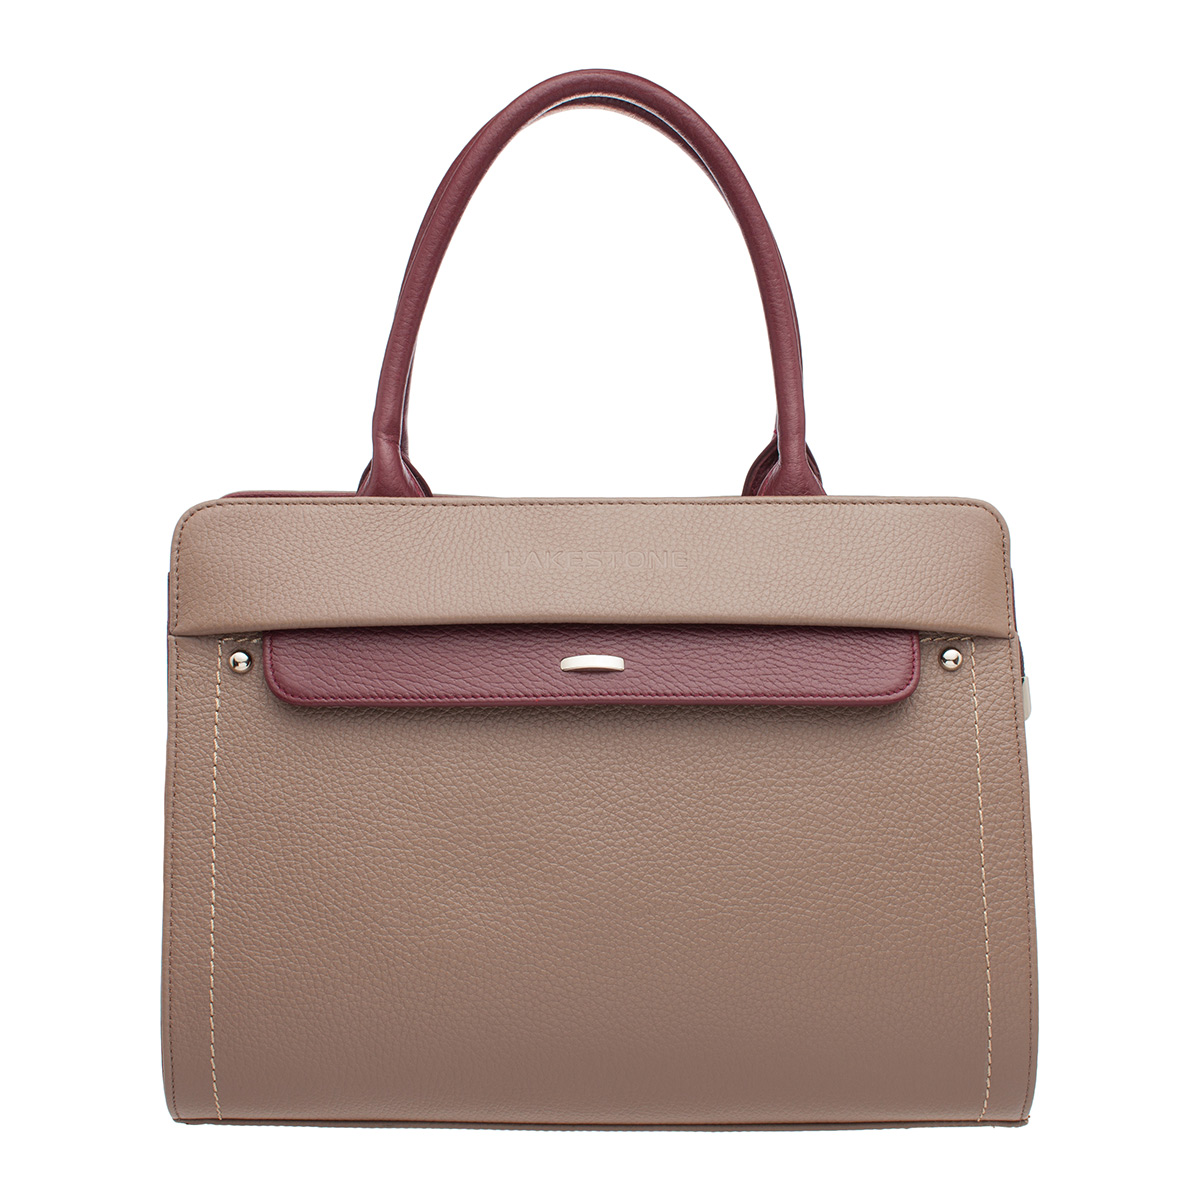 Женская кожаная сумка Darnley Taupe